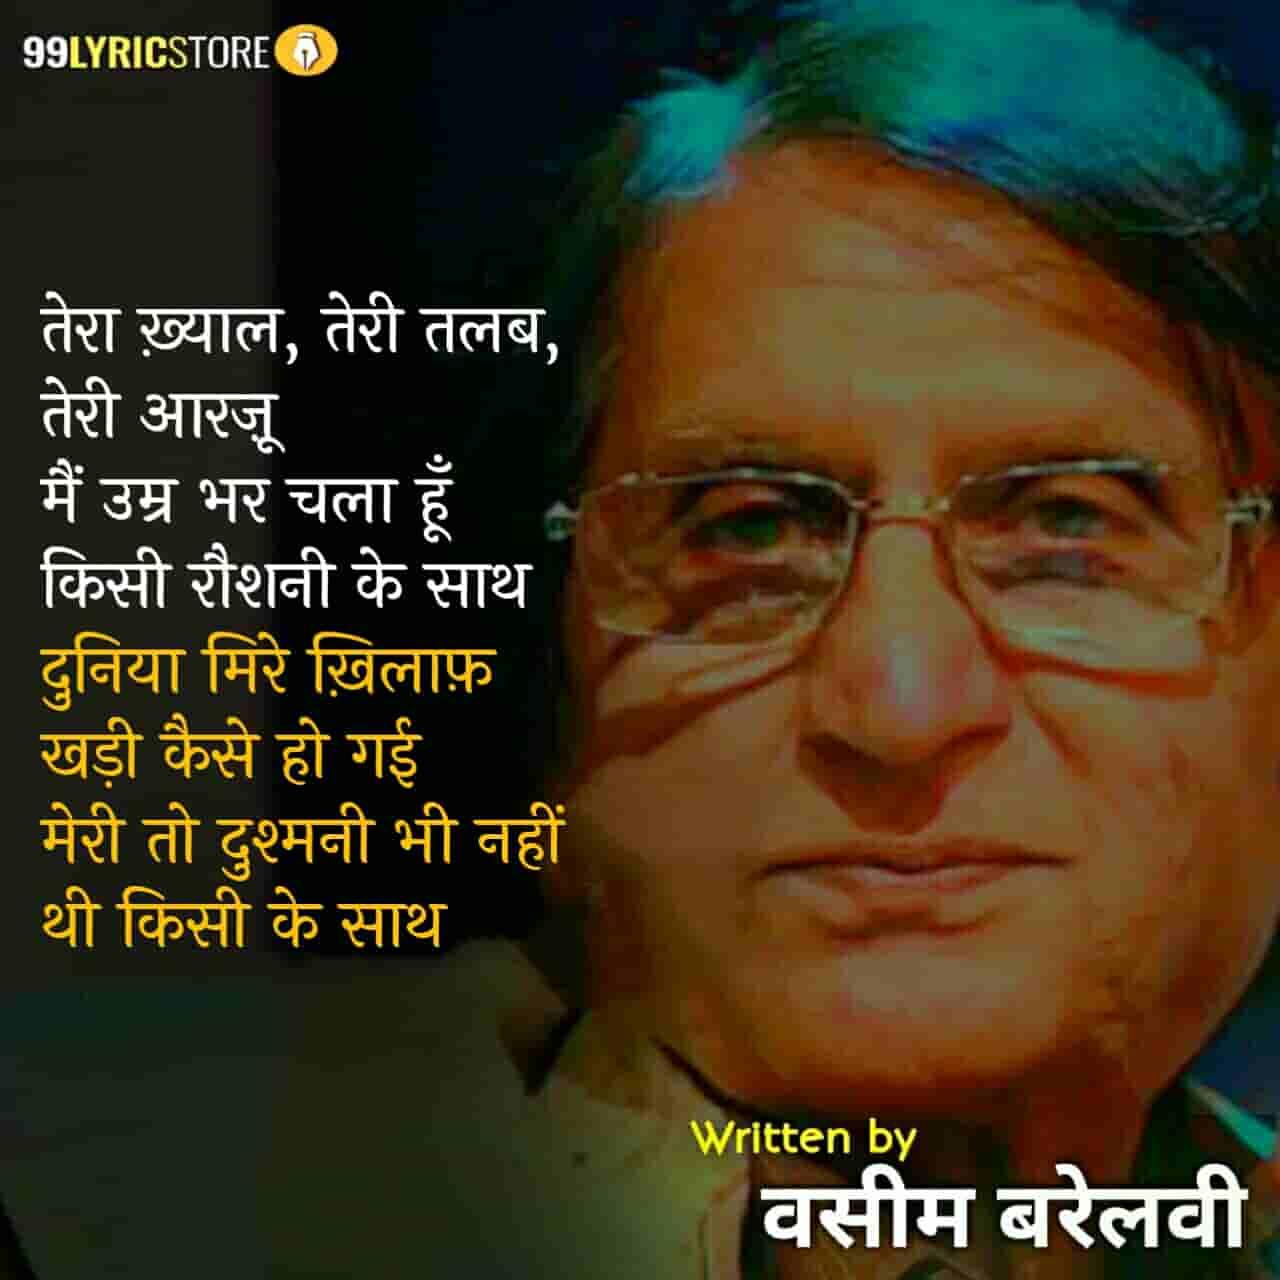 This beautiful Ghazal 'Sab Ne Milaye Haath Yahan Tiragi Ke Saath' has written by Waseem Barelvi.